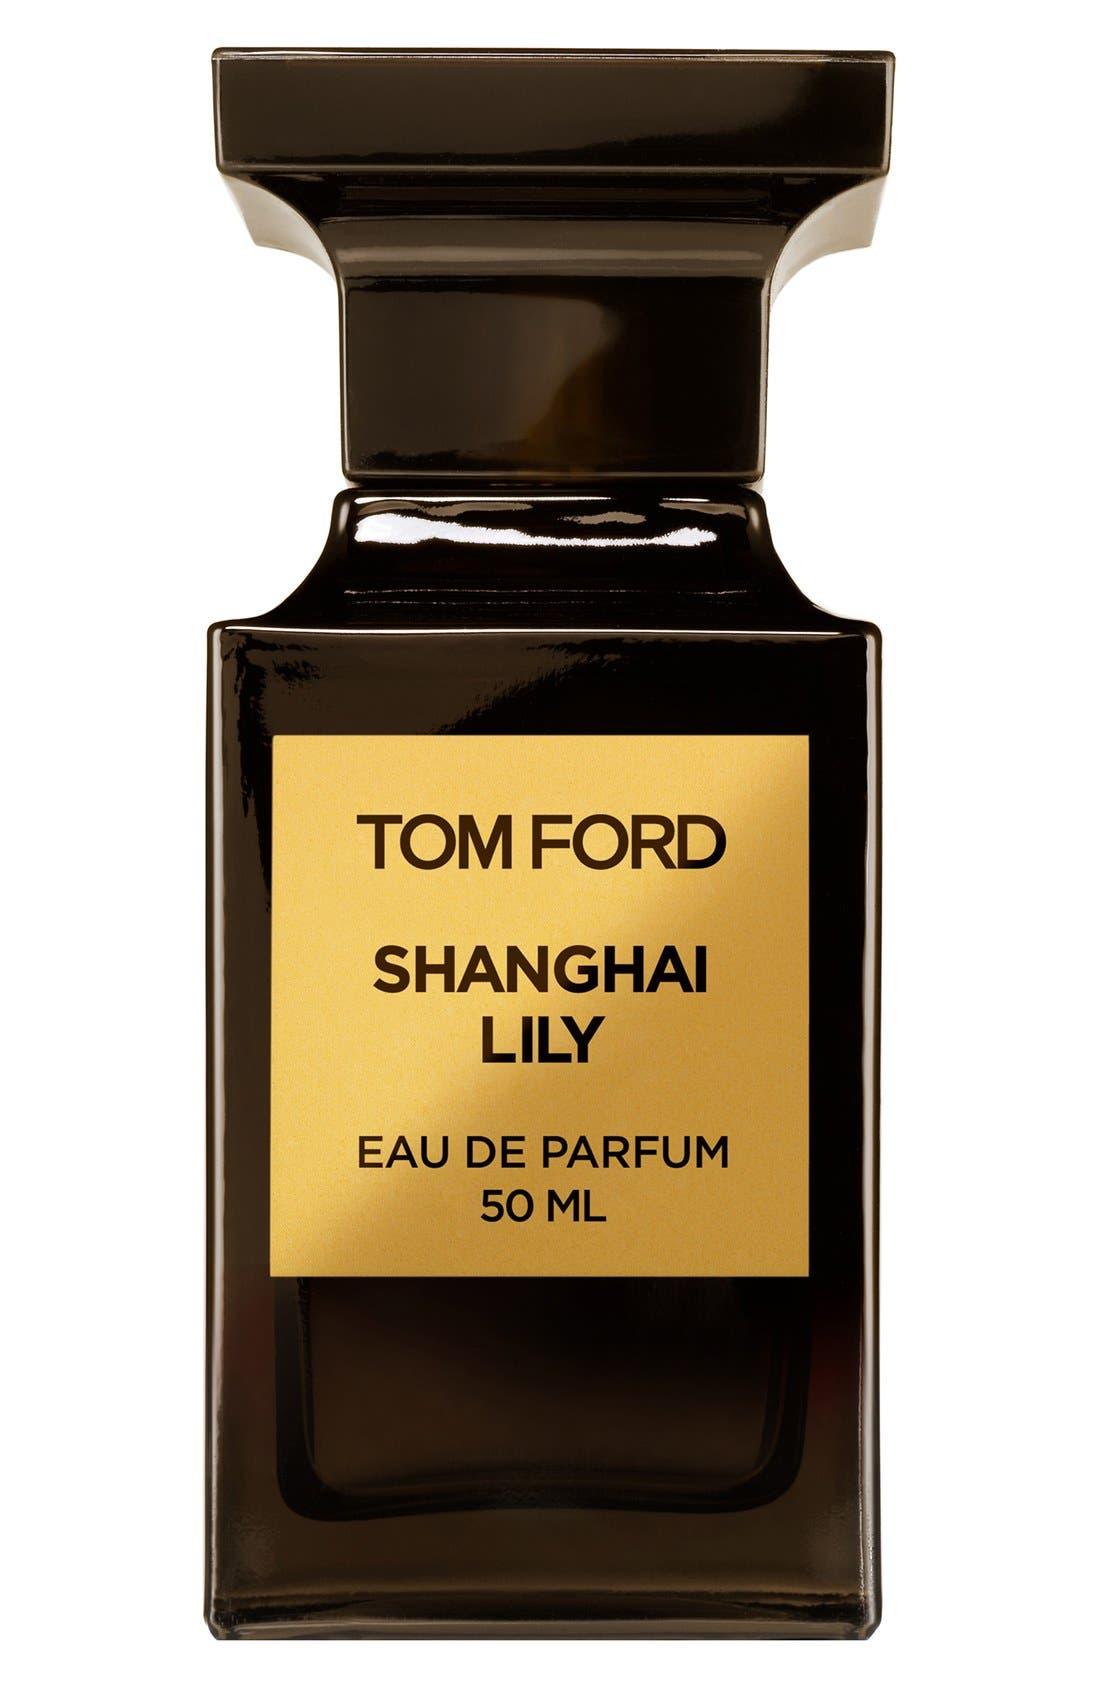 Tom Ford Private Blend Shanghai Lily Eau de Parfum